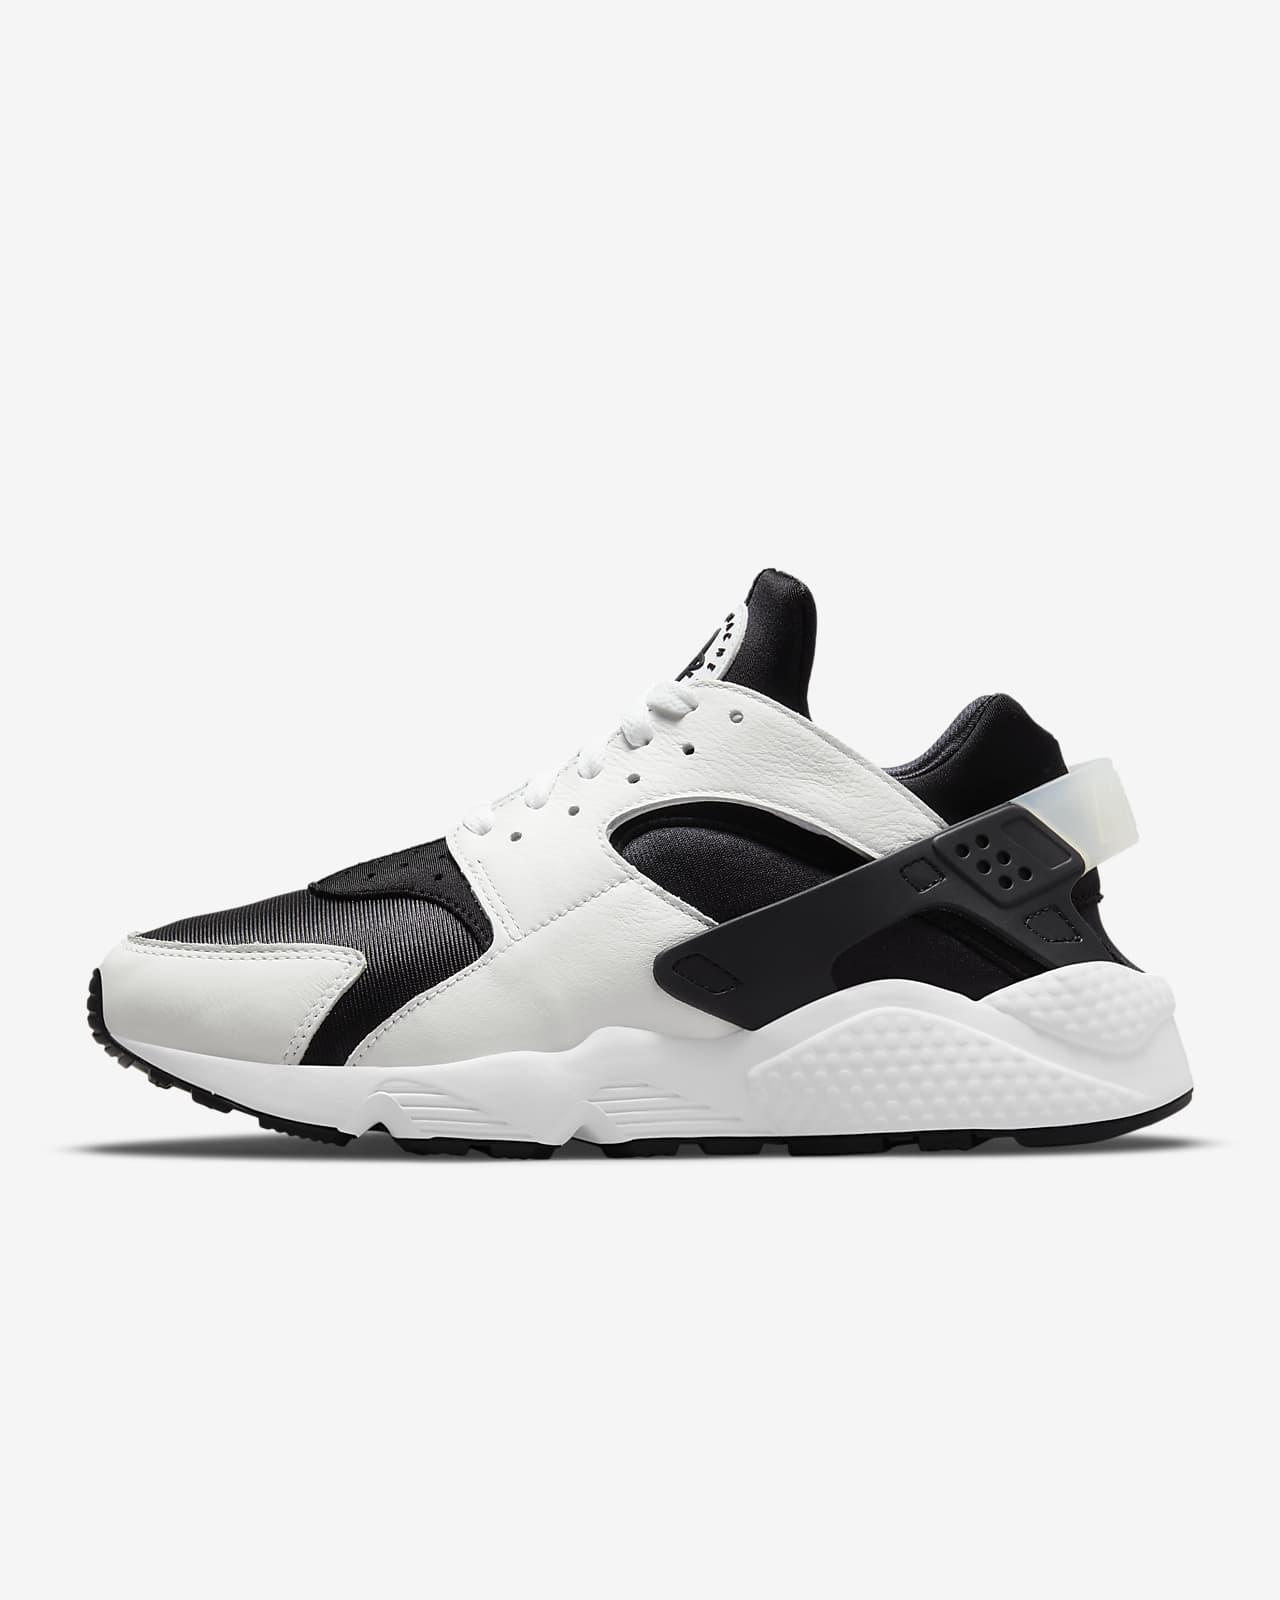 Nike Air Huarache Men's Shoes